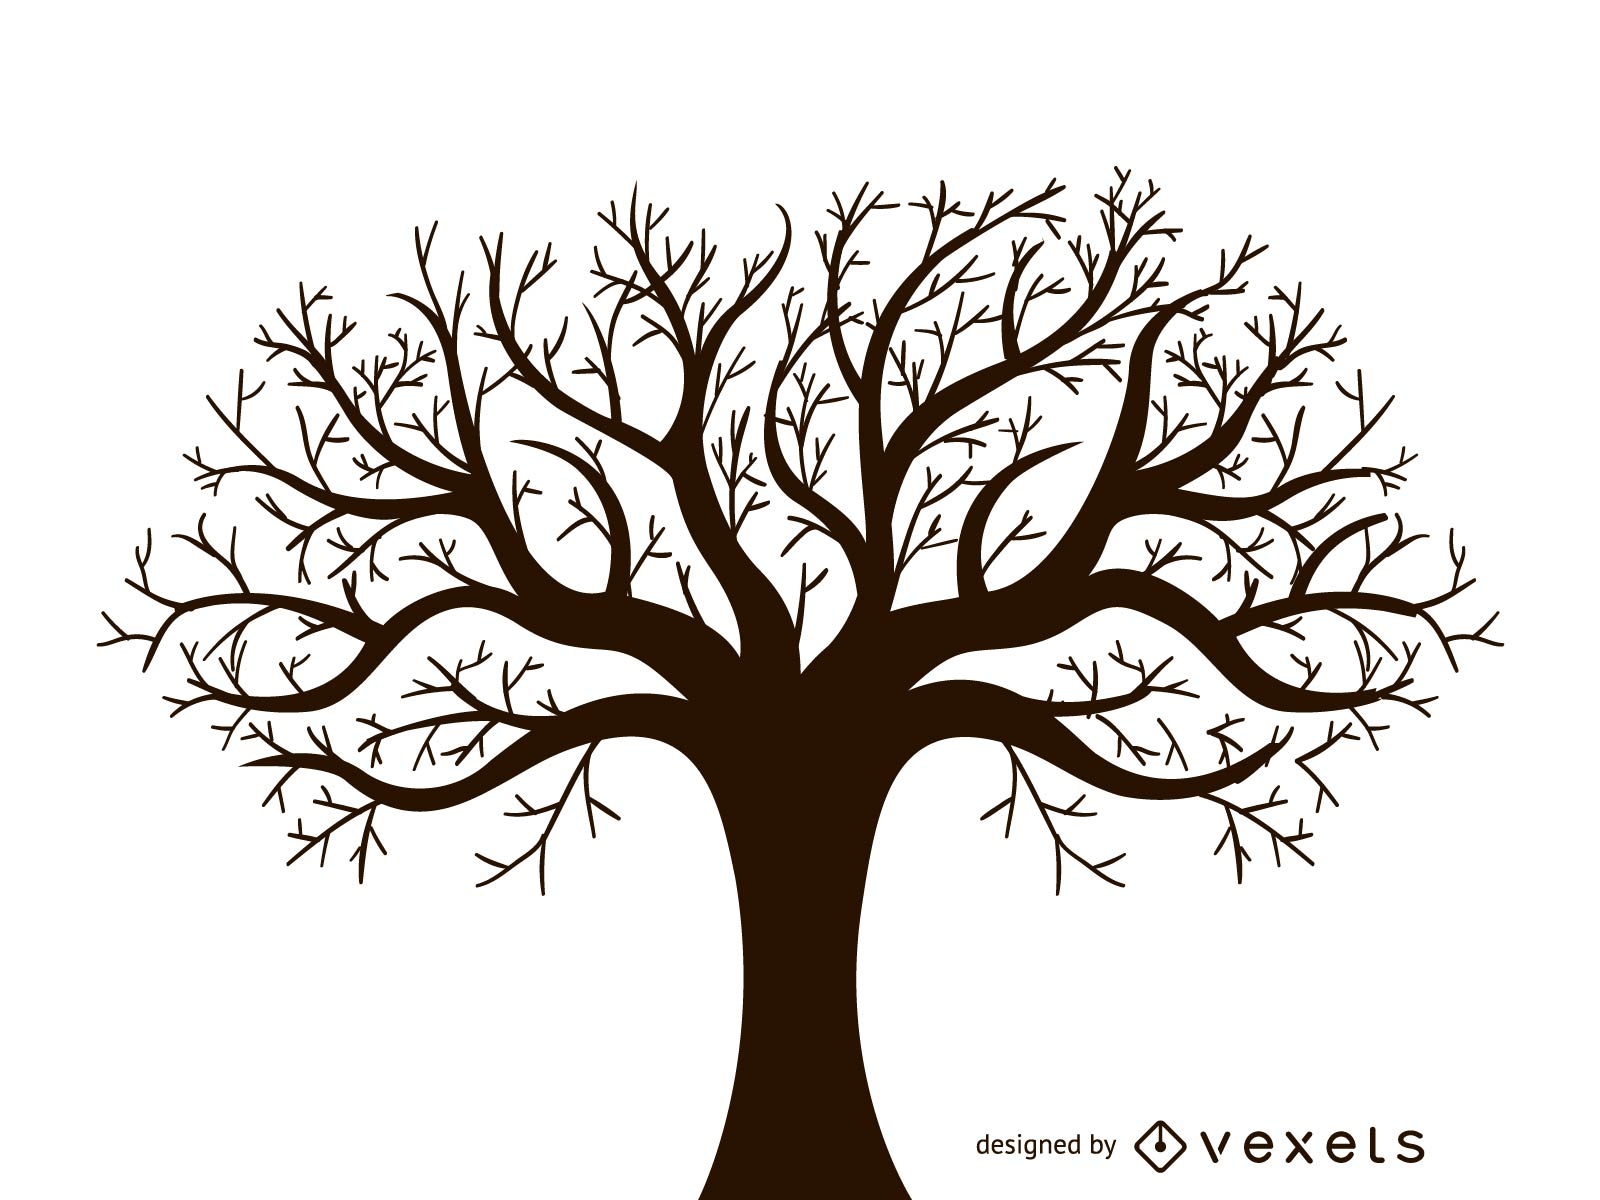 leafless autumn tree design